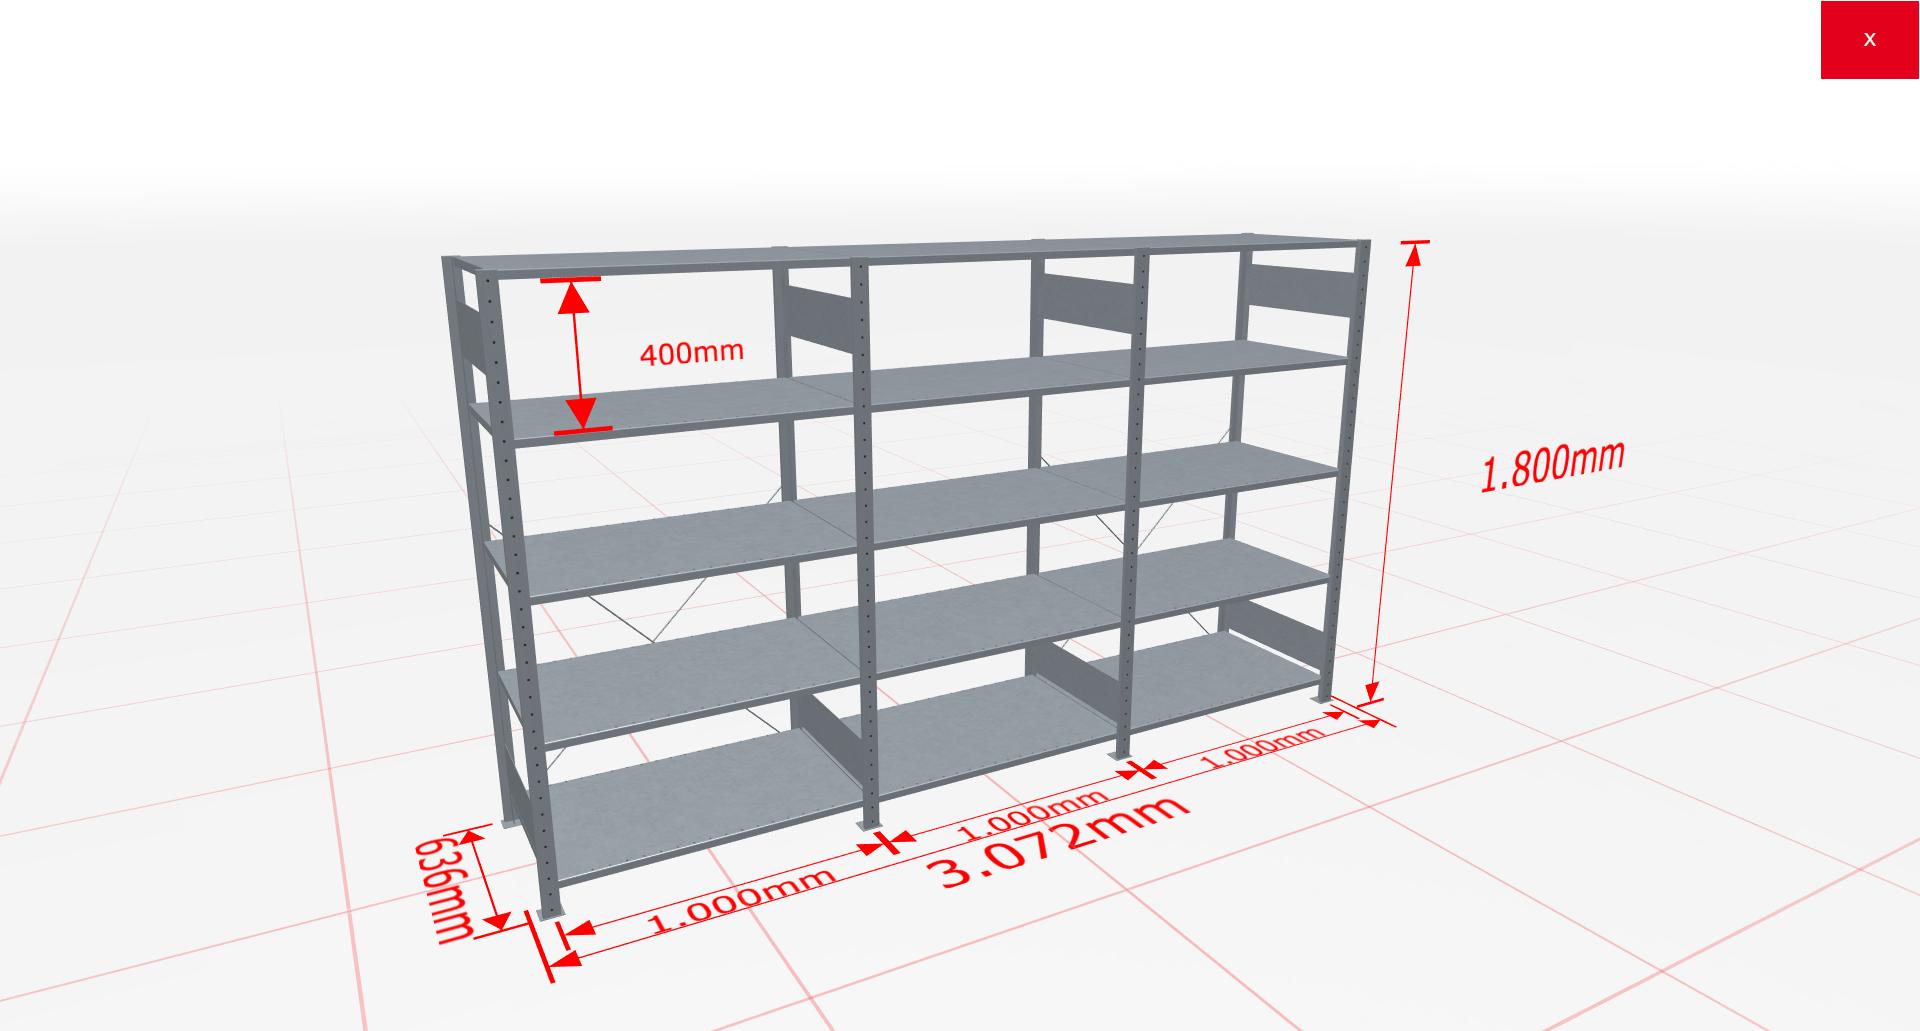 Fachbodenregal Komplettregal 1800x3072x600 mm (HxBxT) SCHULTE Lagertechnik verzinkt 5 Ebenen  150 kg je Boden